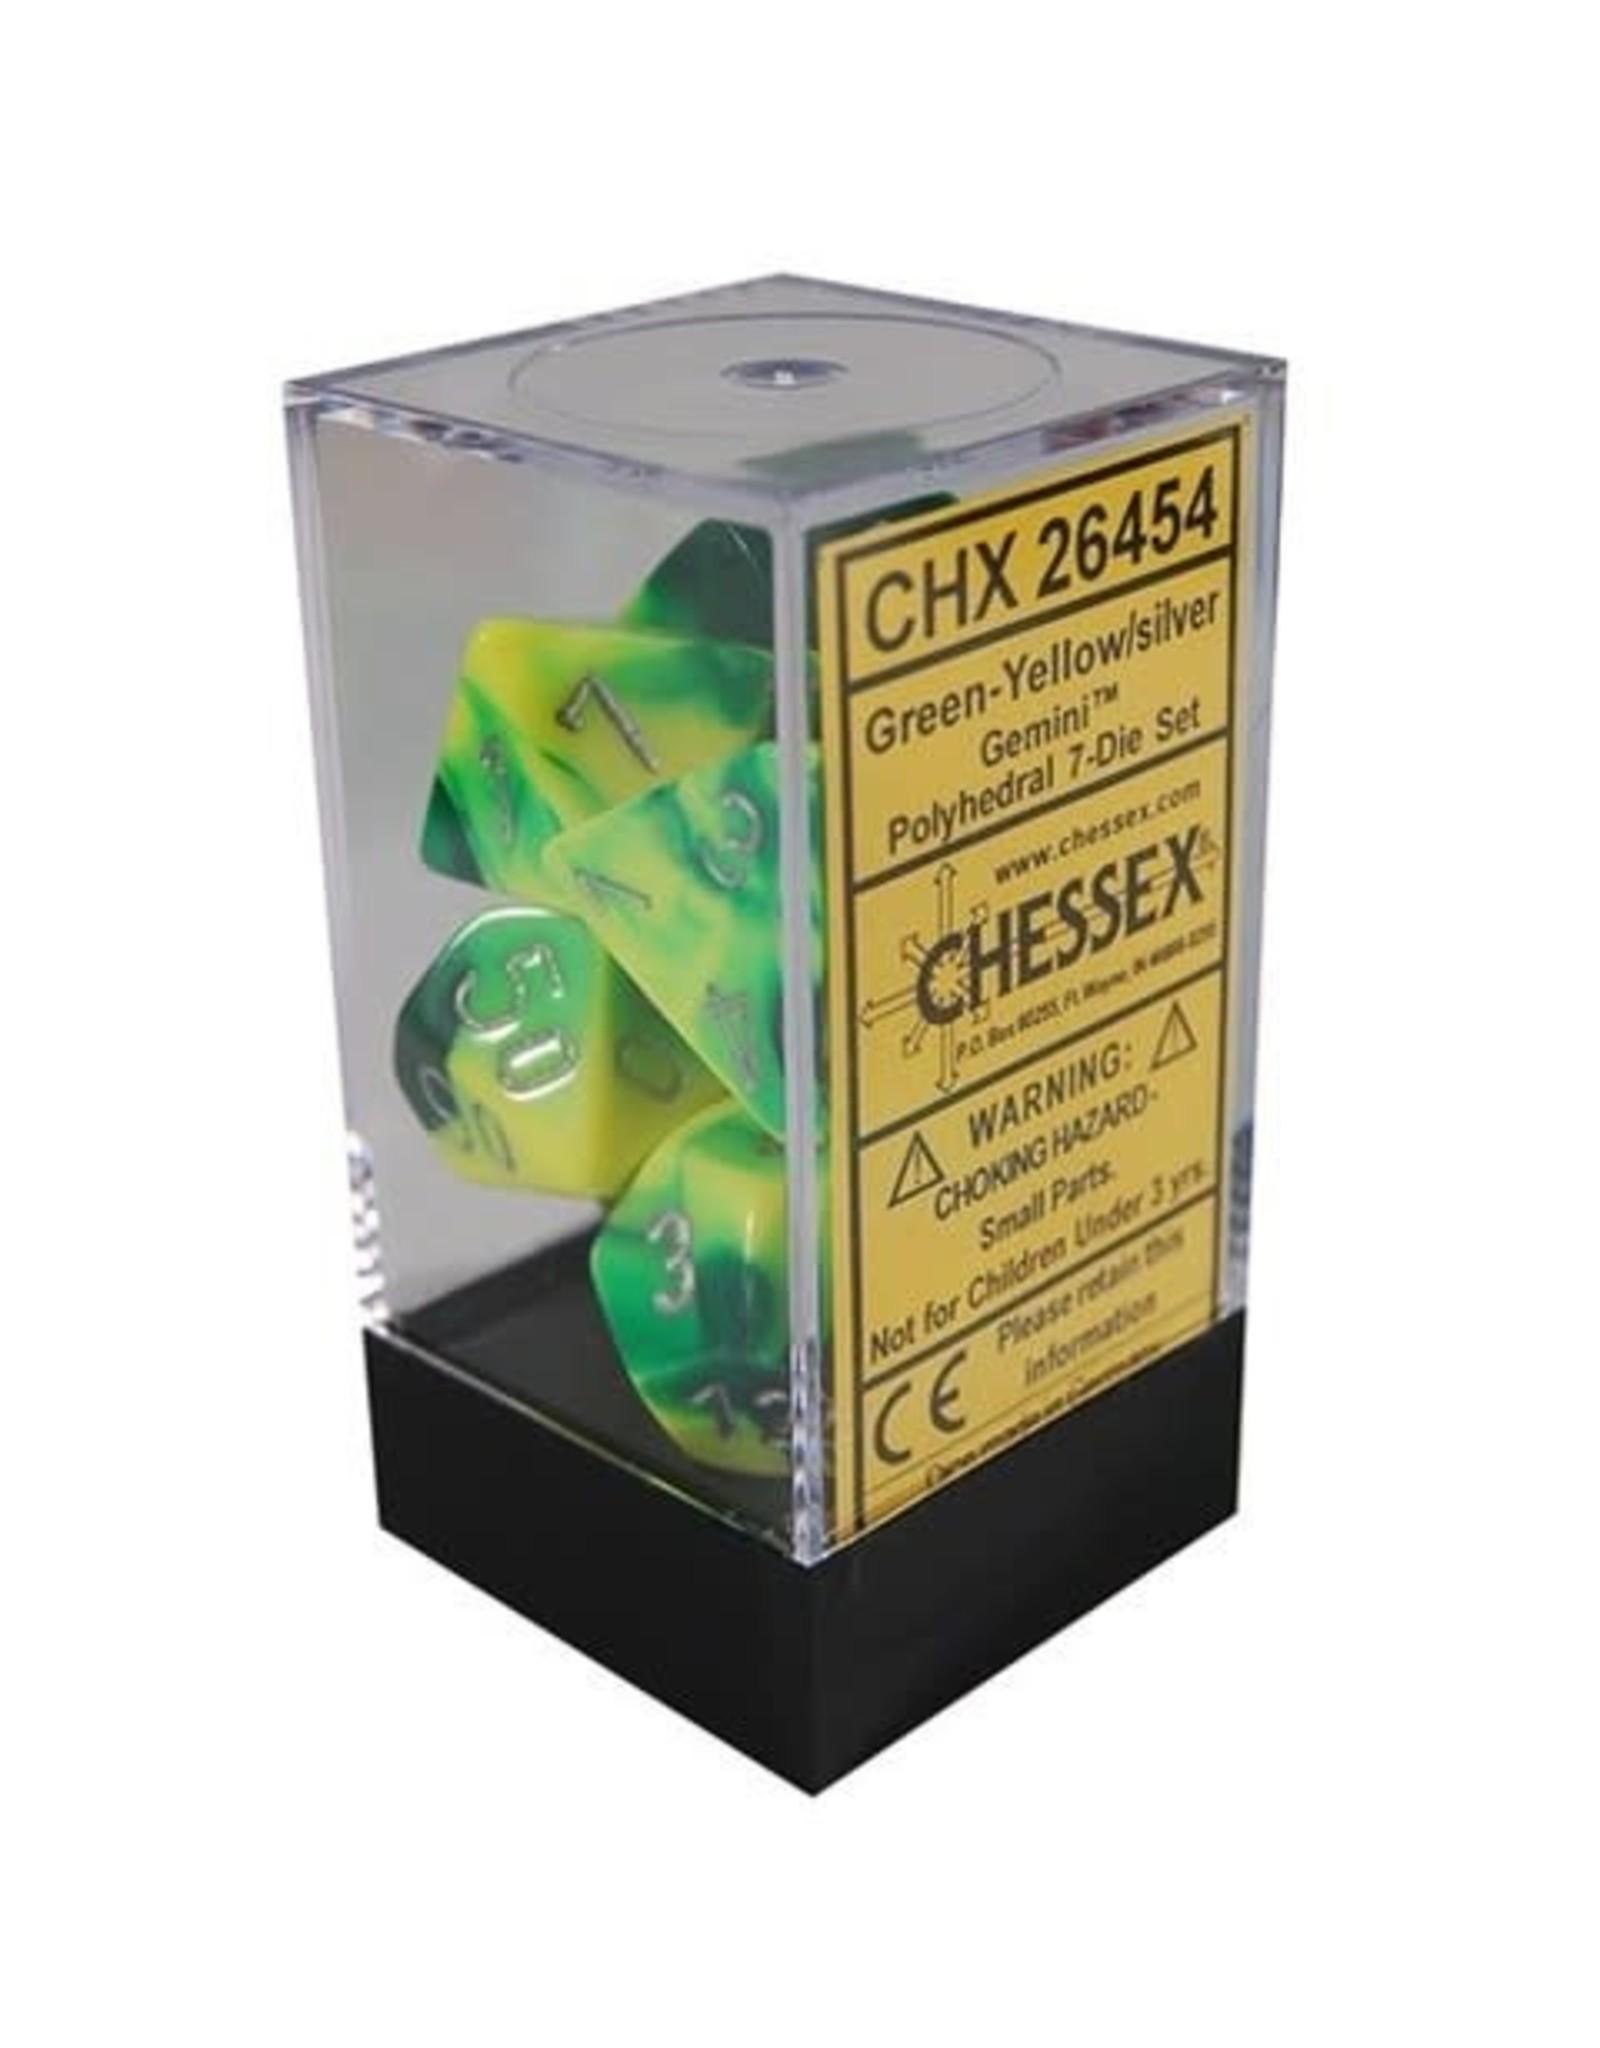 Chessex Gemini Green-Yellow w/silver Polyhedral 7-Die Set